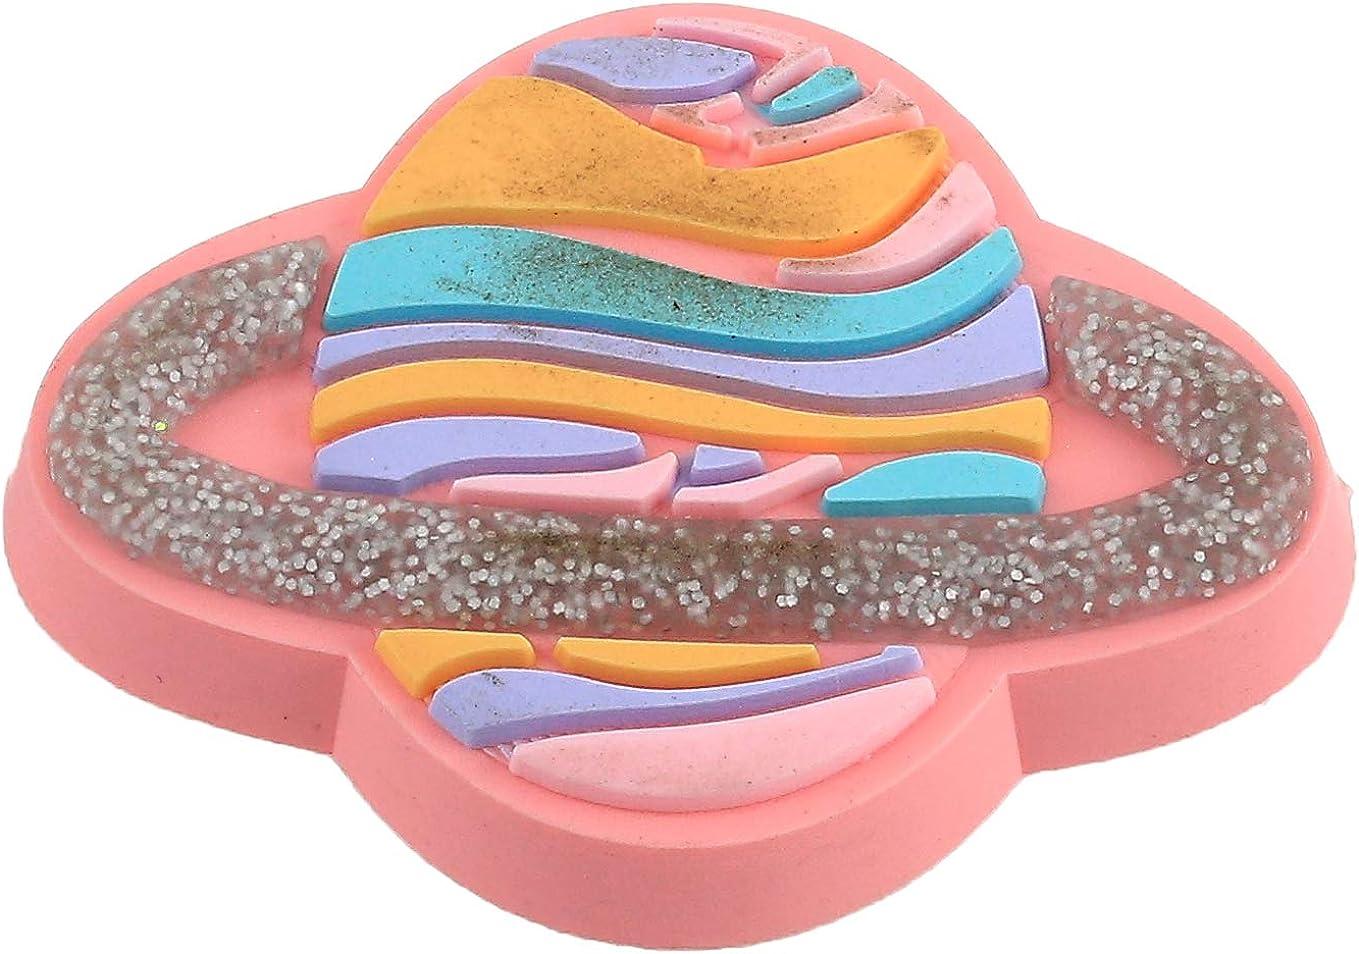 Crocs unisex-adult Jibbitz Nature Shoe Charms | Jibbitz for Crocs